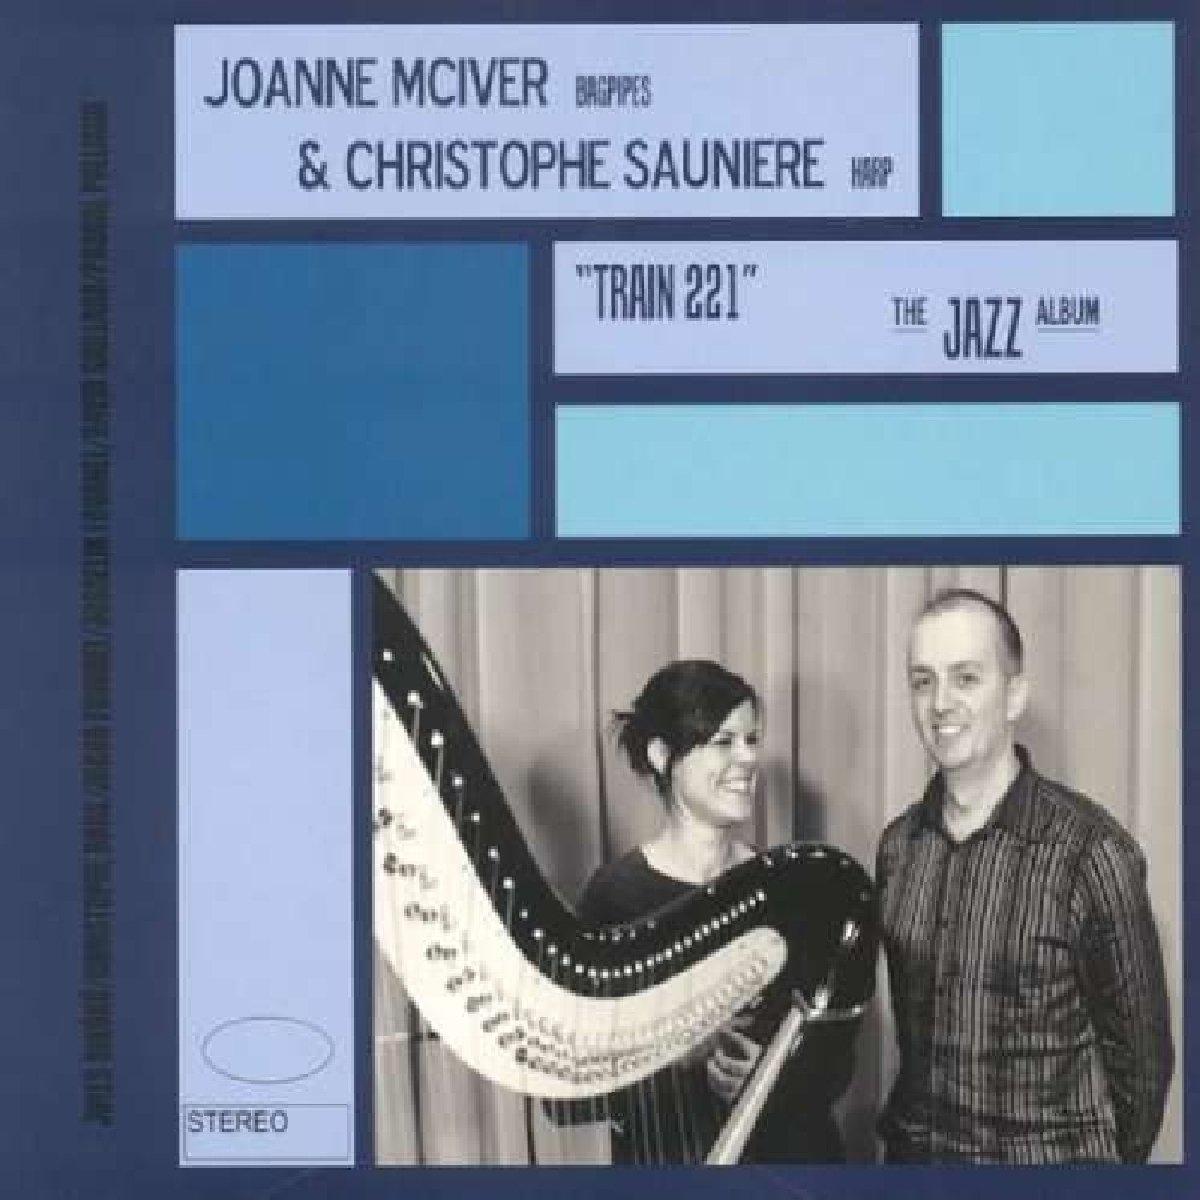 CD : Joanne McIver - Train 221: The Jazz Album (Digipack Packaging)